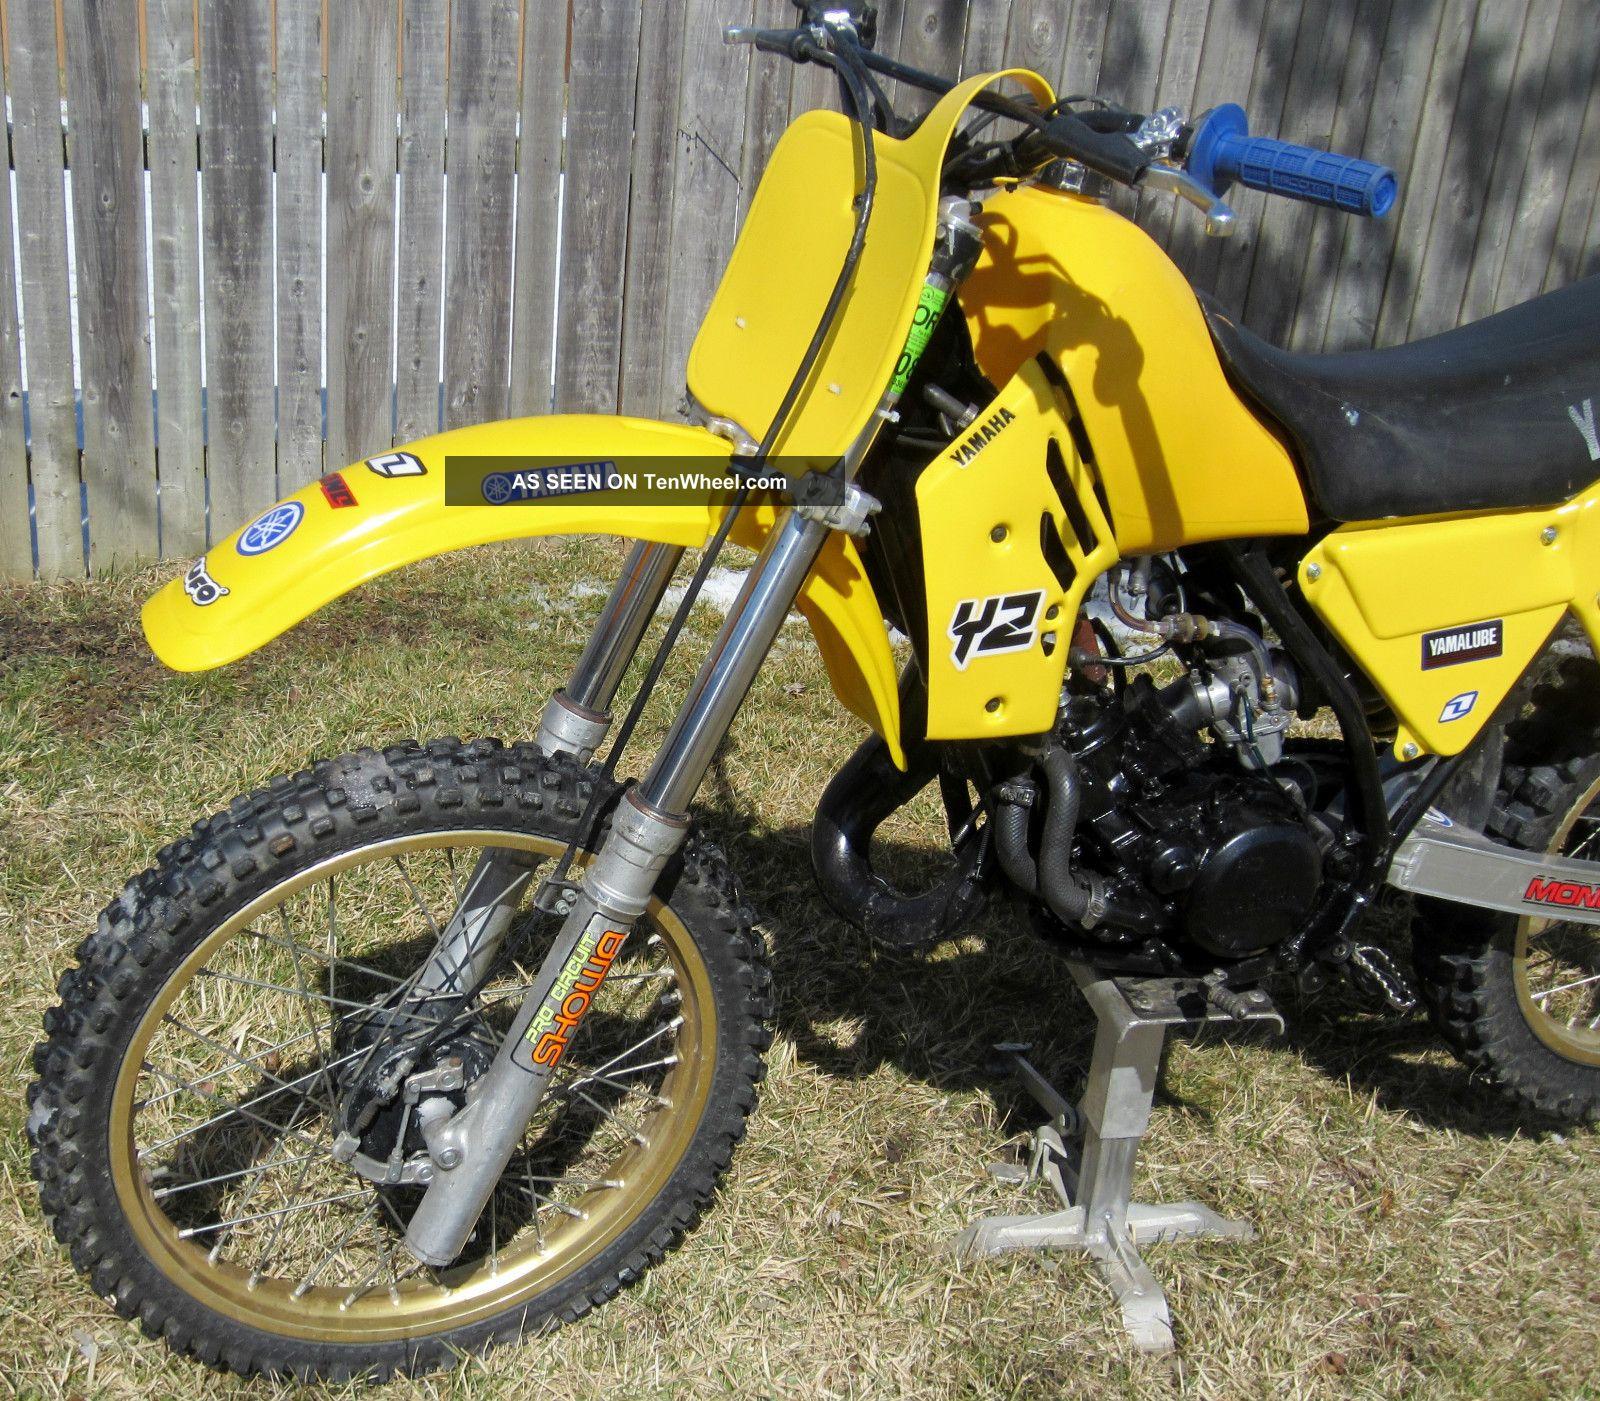 1984 yamaha yz125 yz 125 ahrma vintage motocross dirt bike. Black Bedroom Furniture Sets. Home Design Ideas